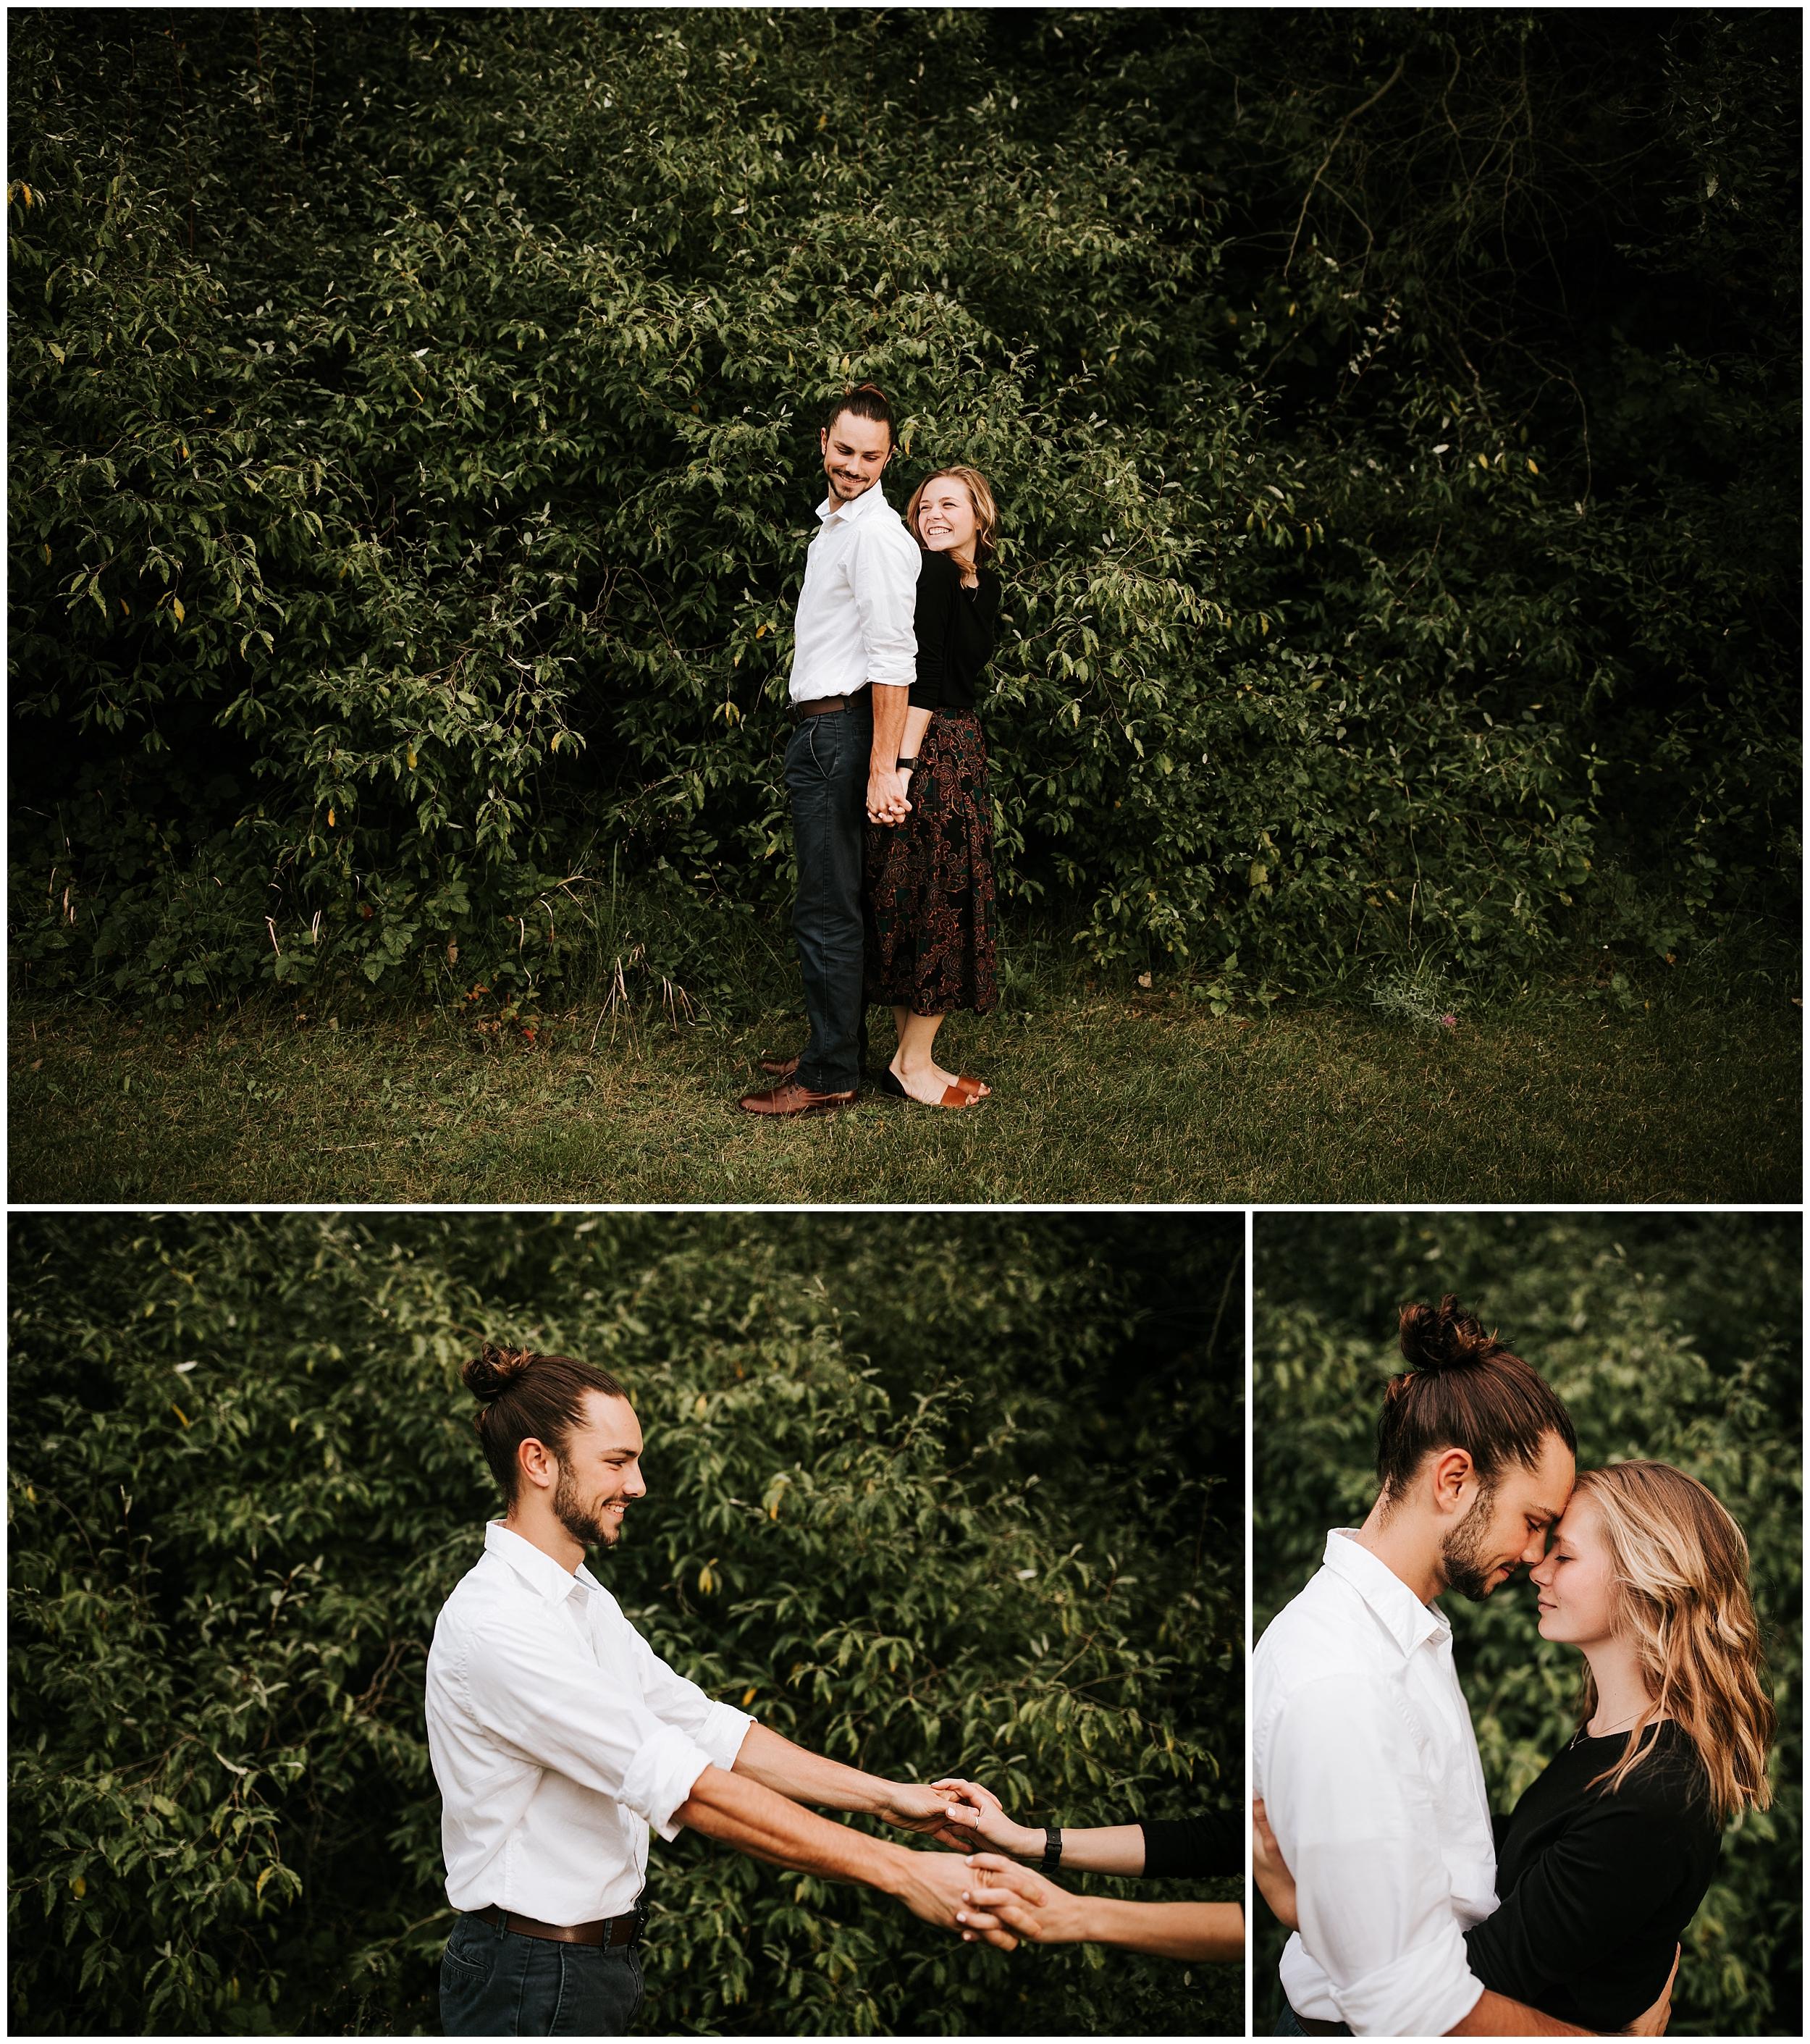 Sam+Billy-Engaged-84_WEB.jpg